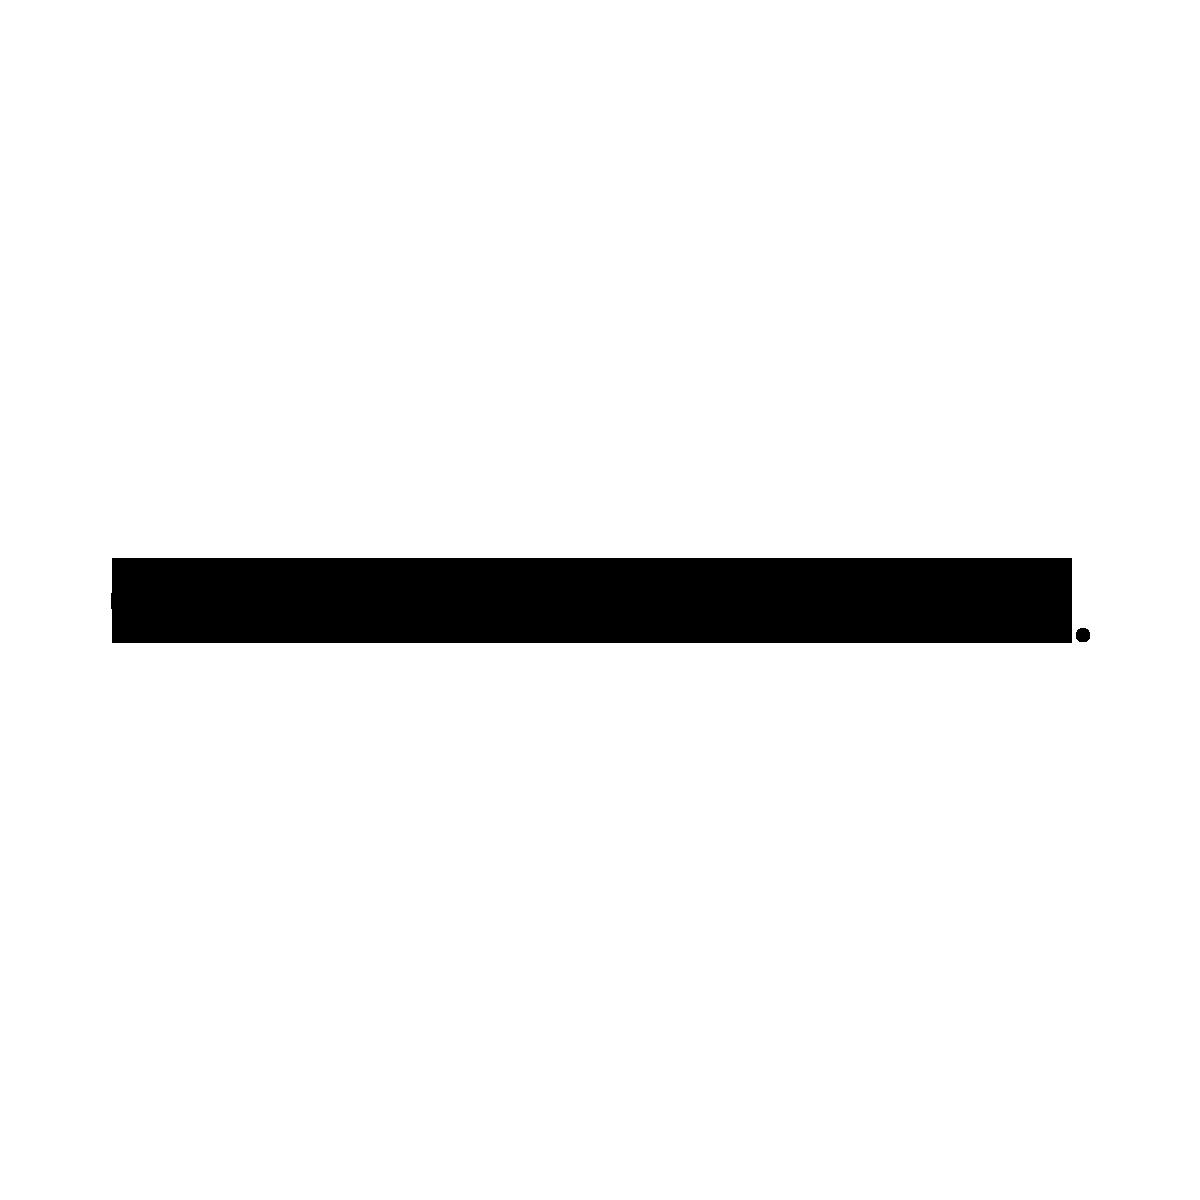 Espadrille-slipper-metallic-zilver